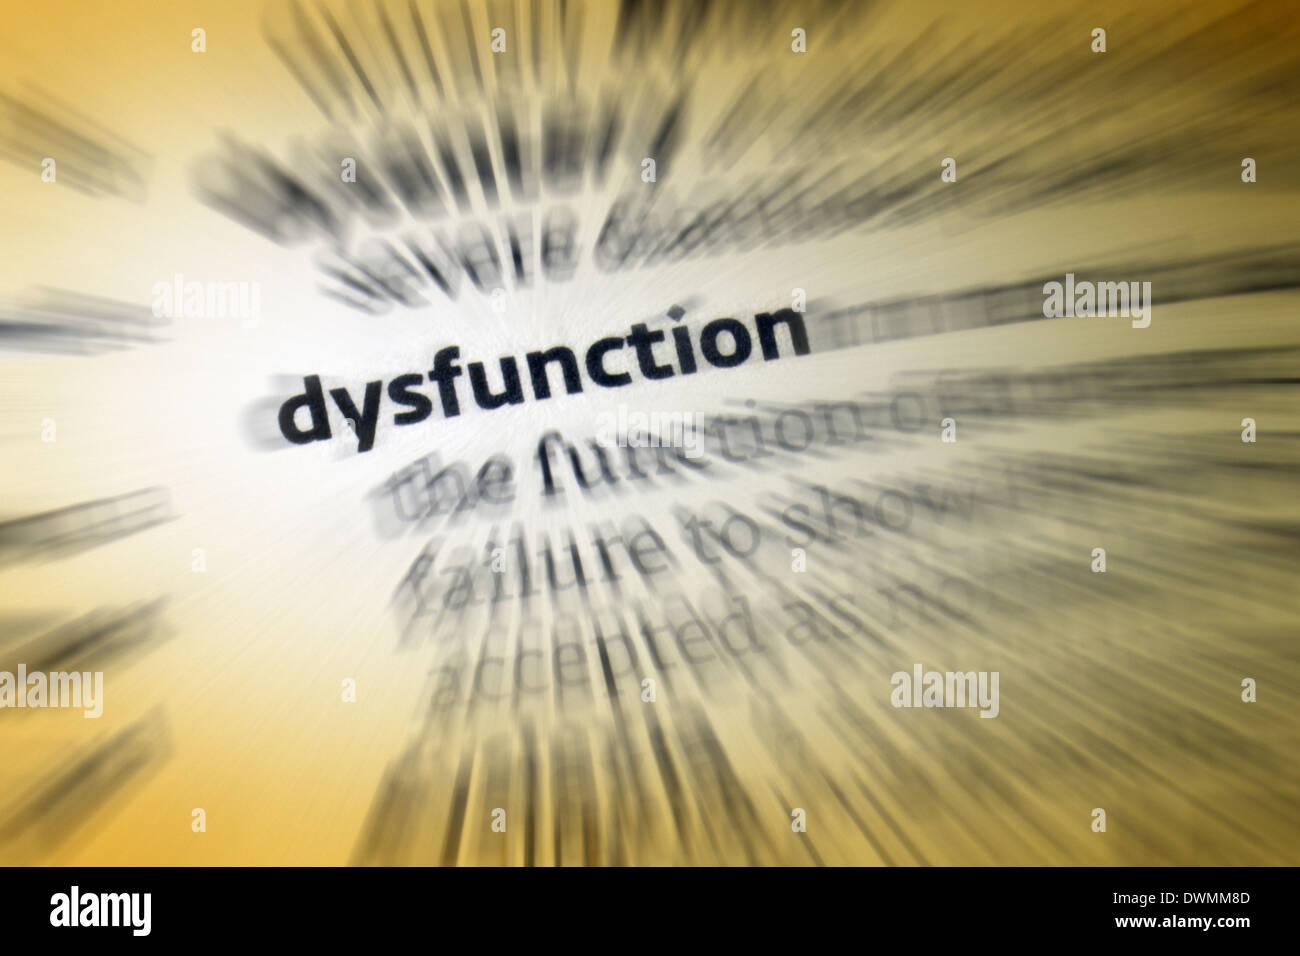 Dysfunction - Stock Image